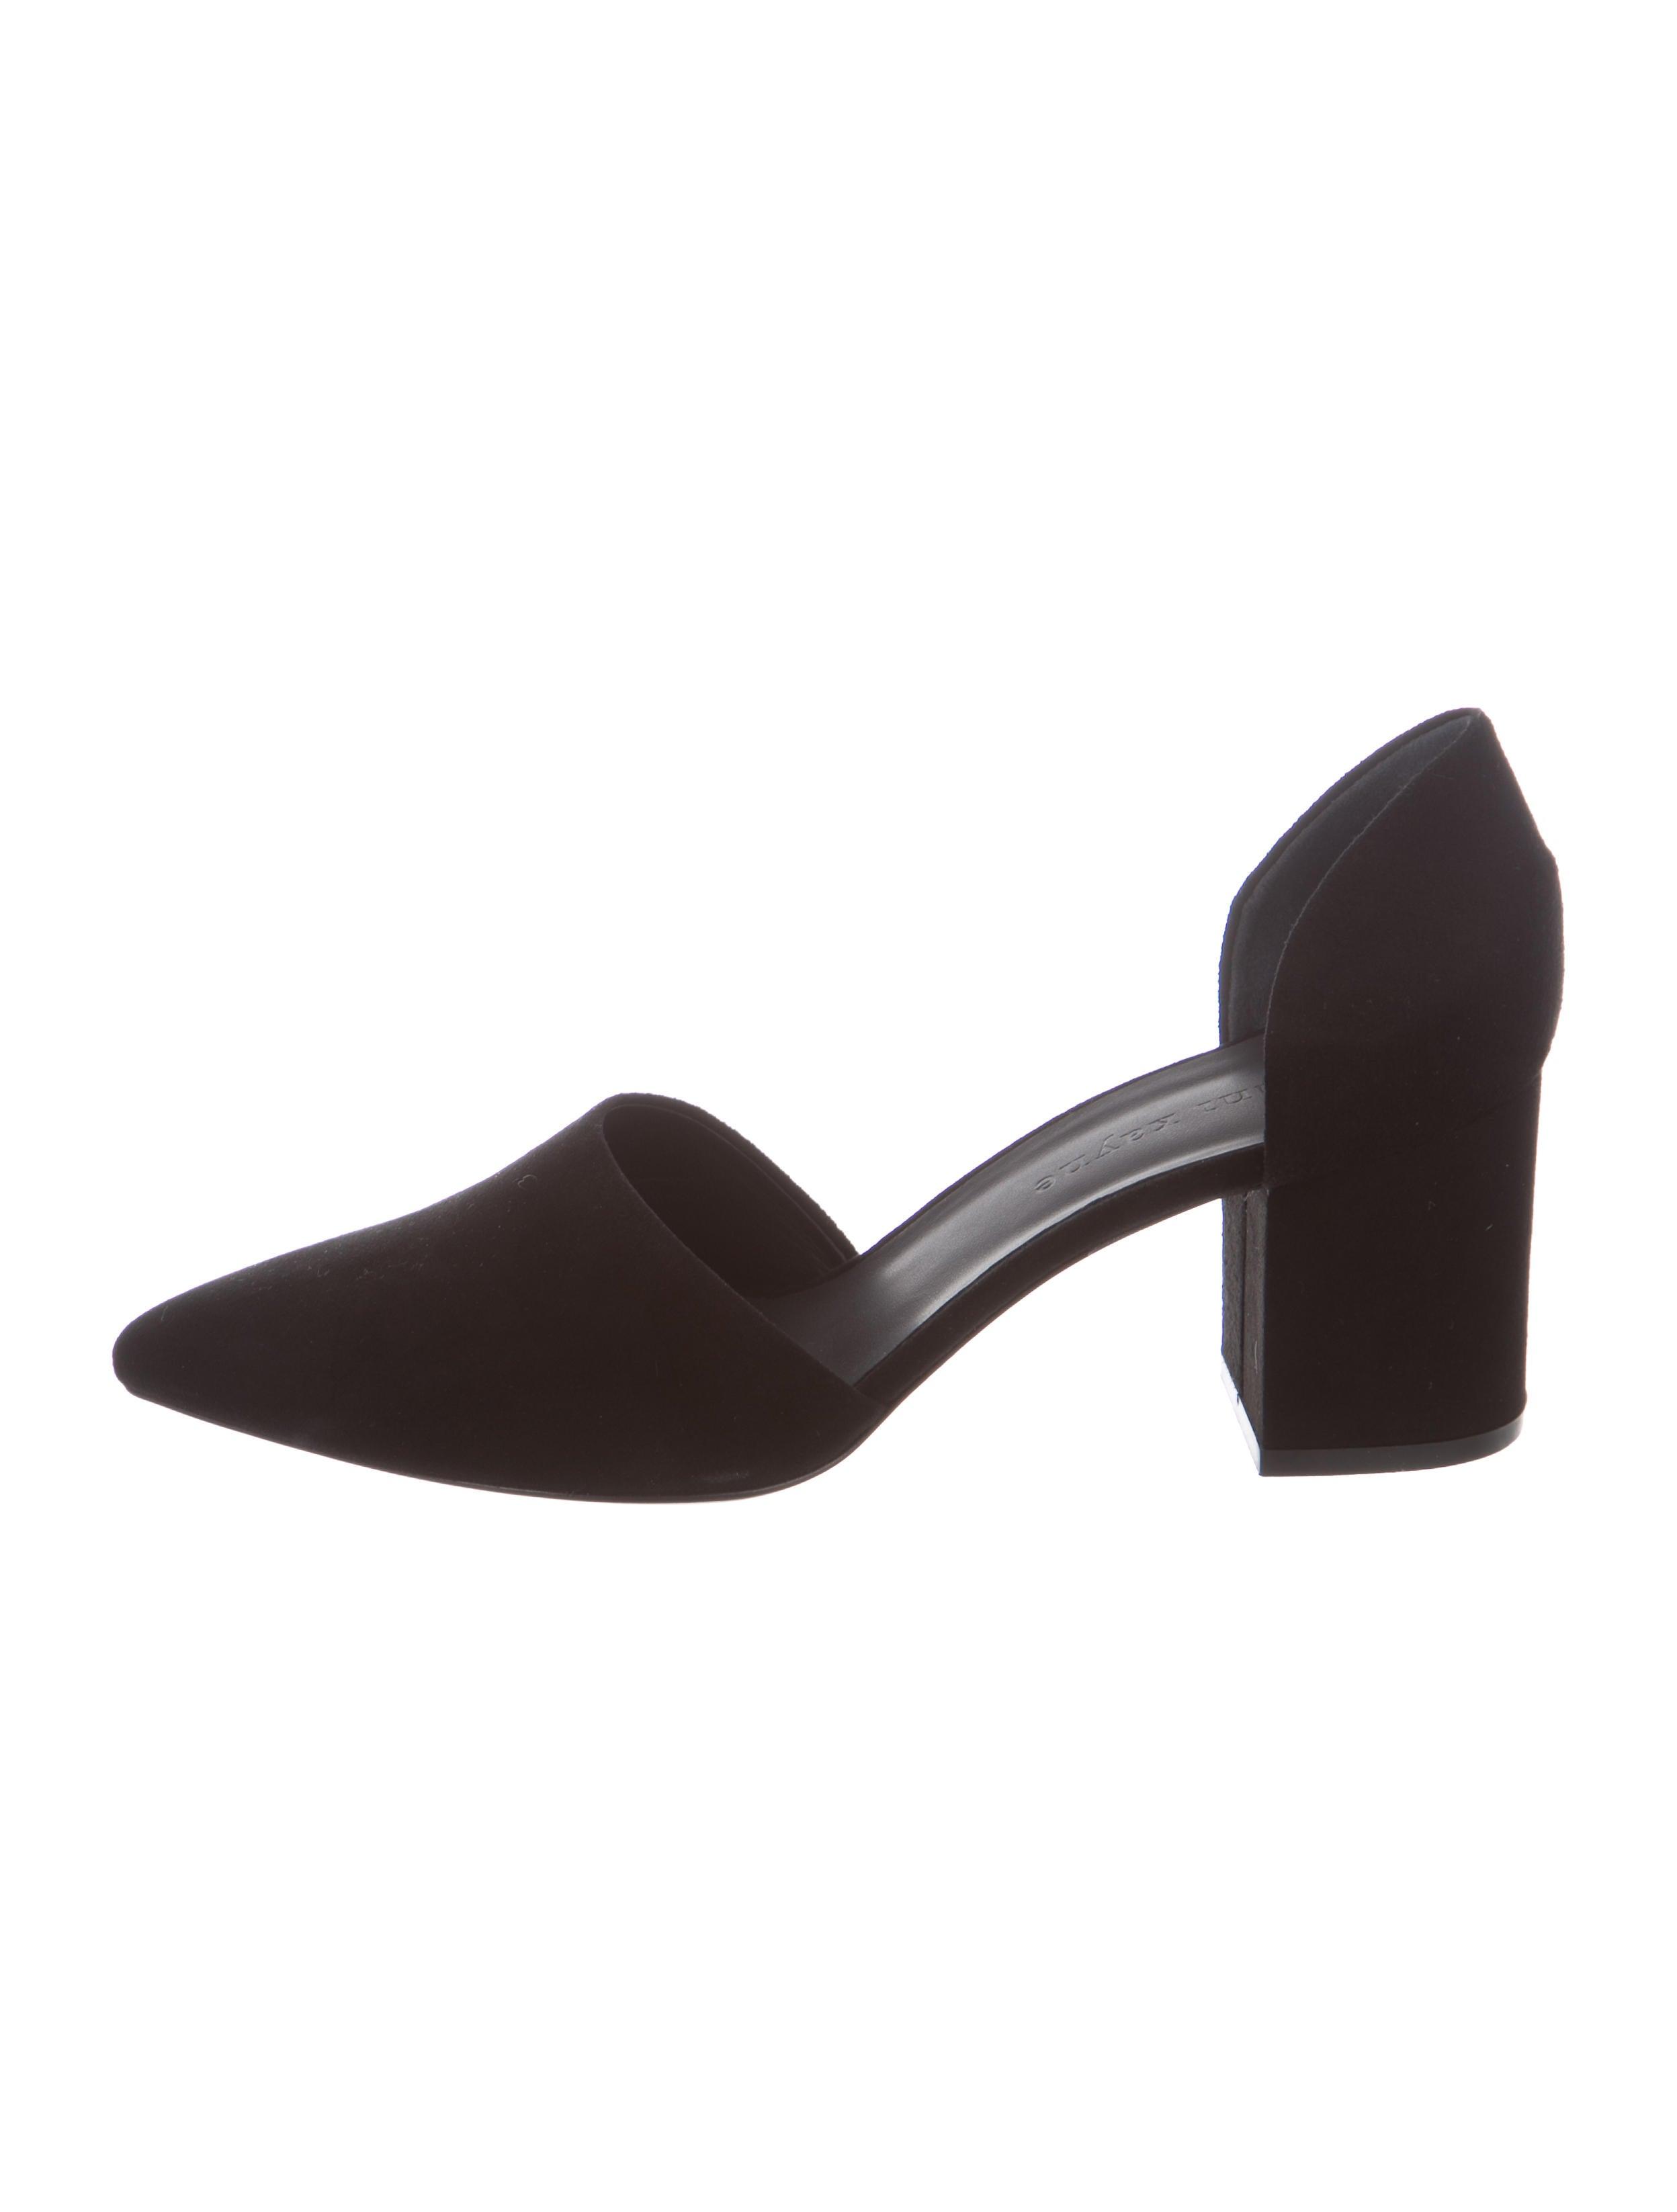 Jenni Kayne Pointed-Toe d'Orsay Pumps free shipping sneakernews HKZJT